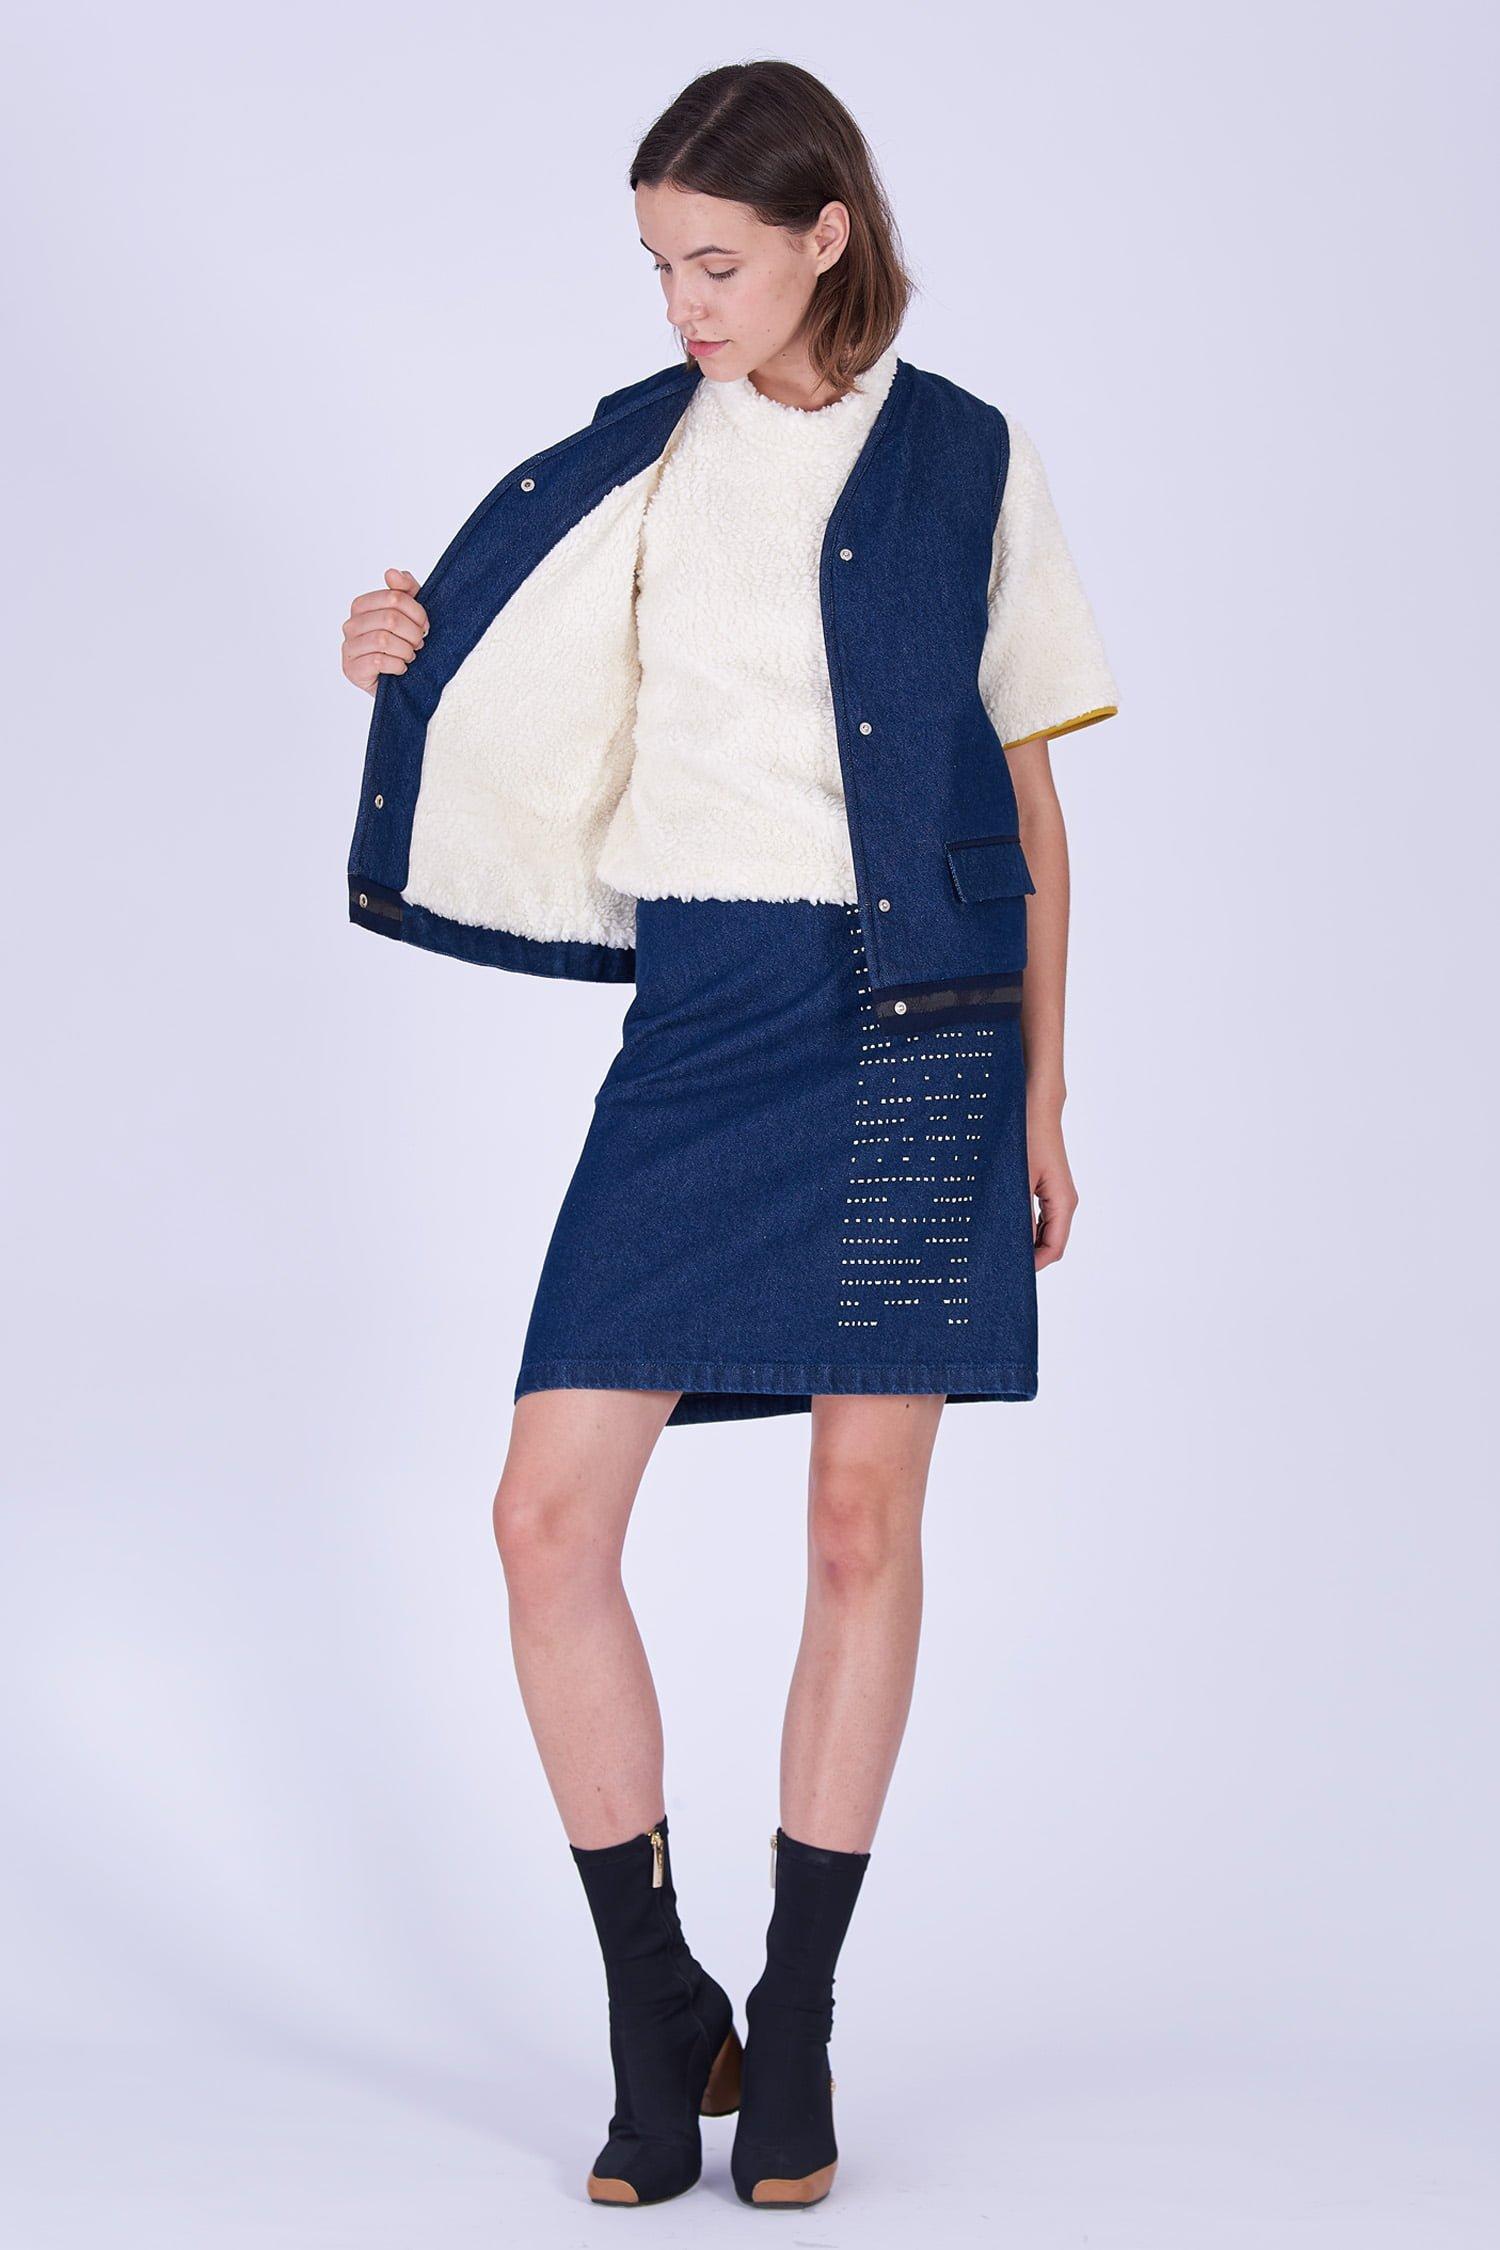 Acephala Fw19 20 Sleeveless Denim Vest Fleece Spodnica Denim Print Kamizelka Jeans Baranek Spodnica Jeans Nadruk Front 2